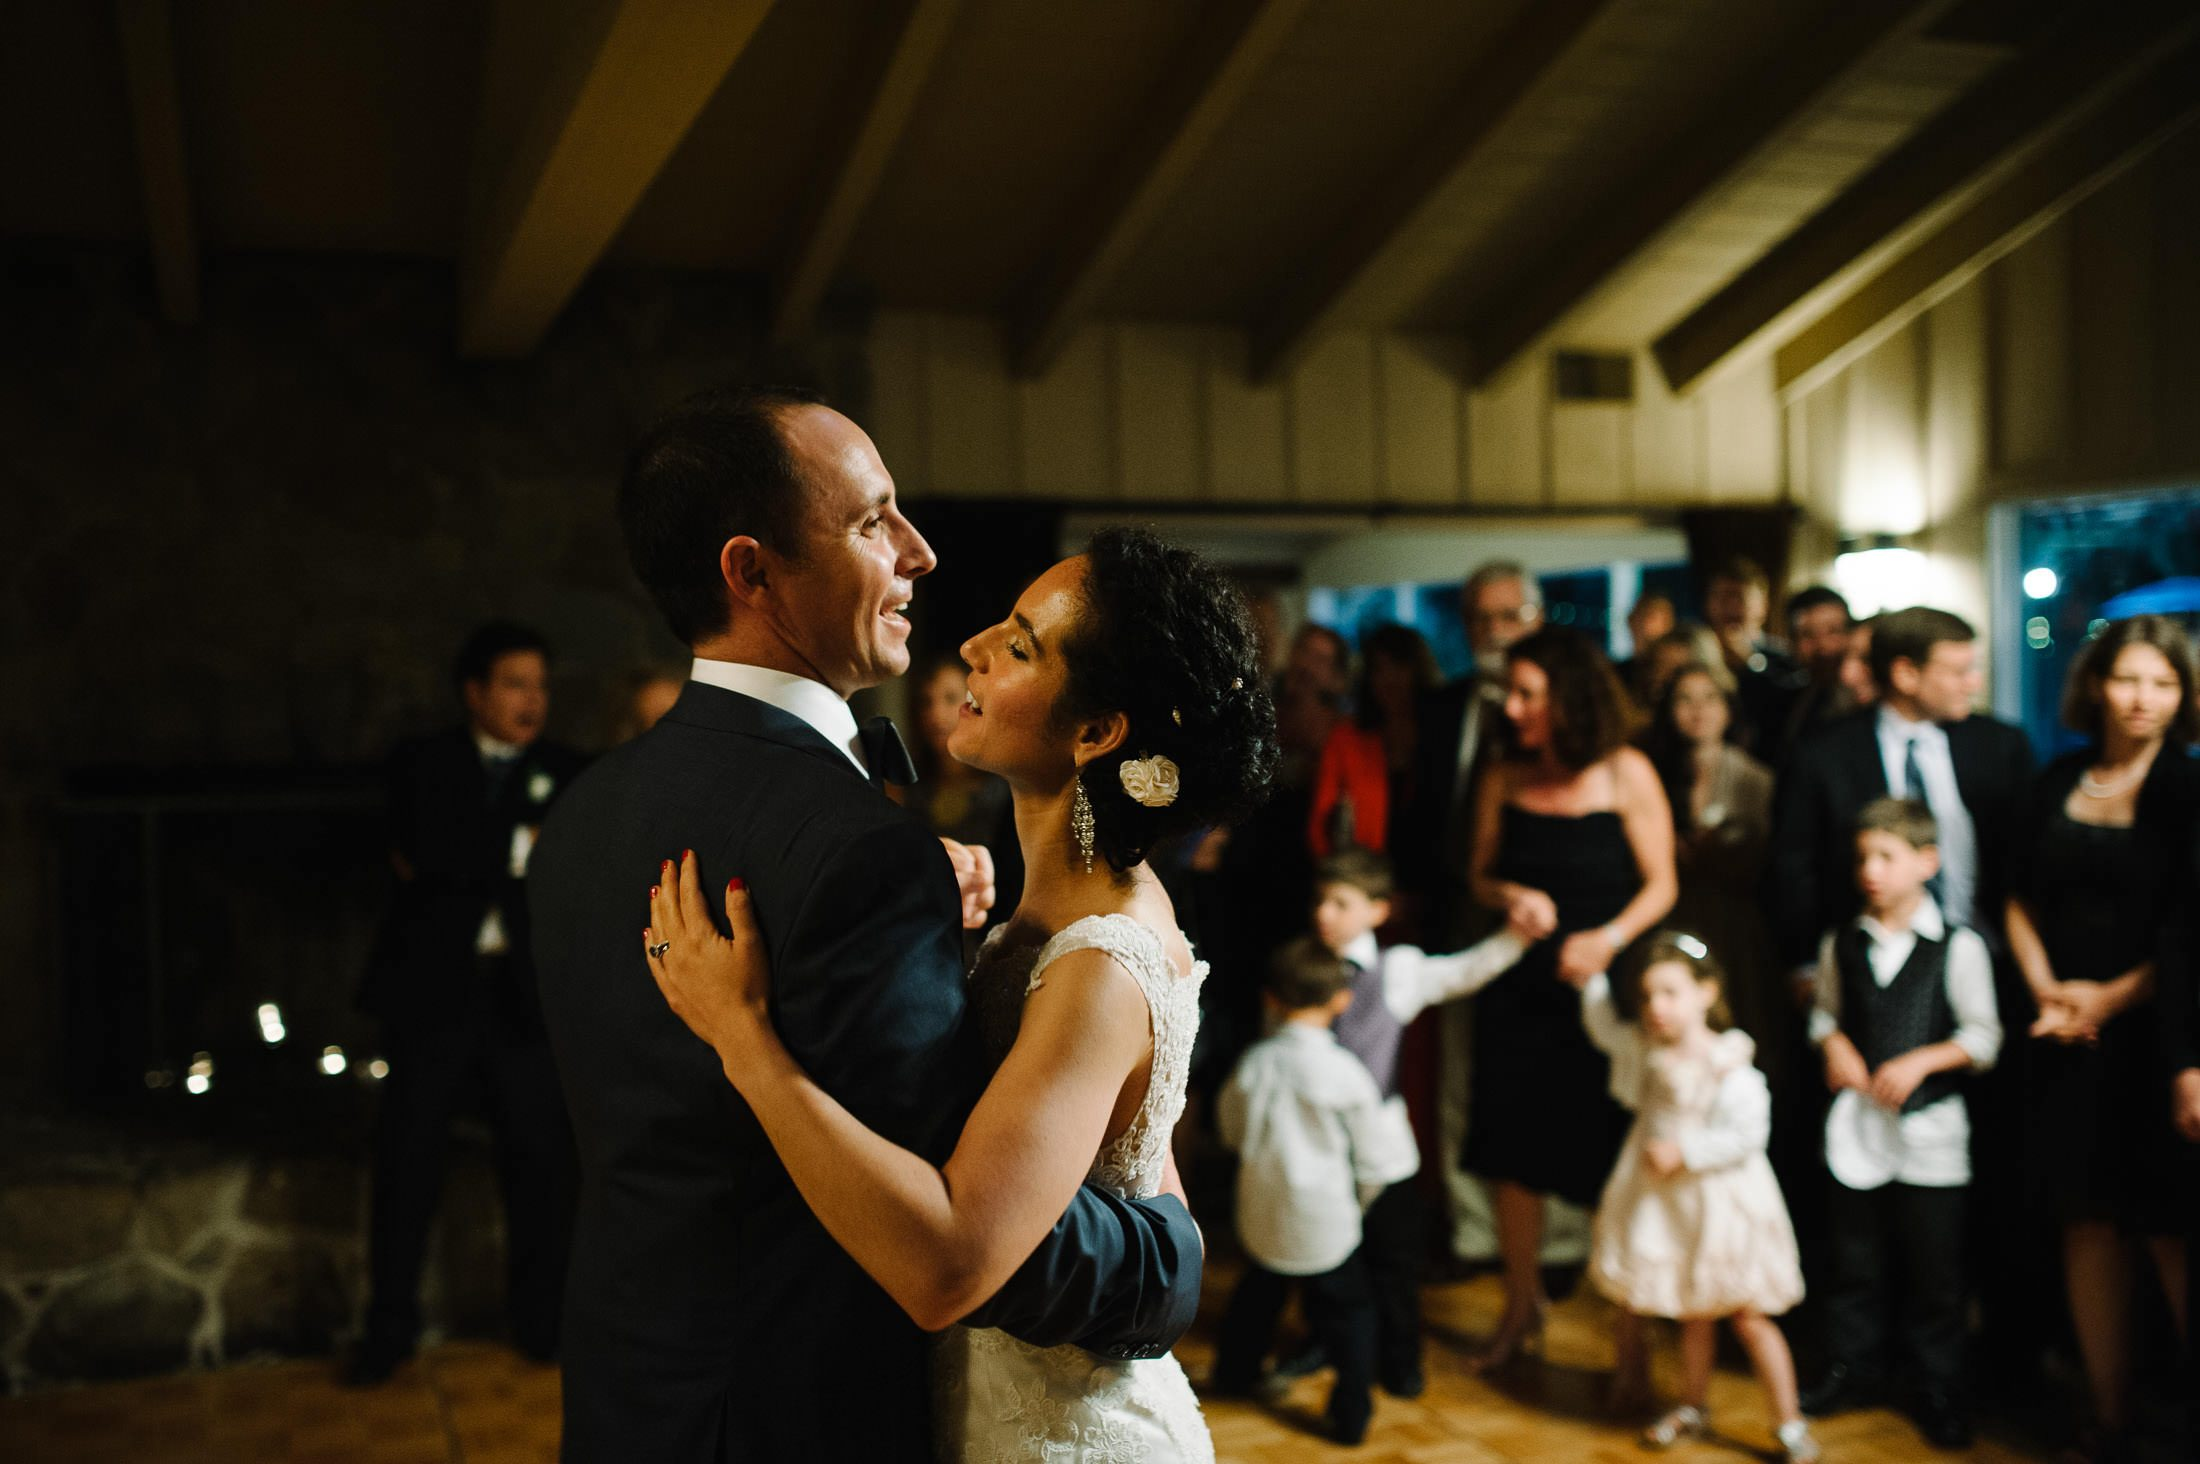 Dancing at Jewish Wedding at Mountain Terrace